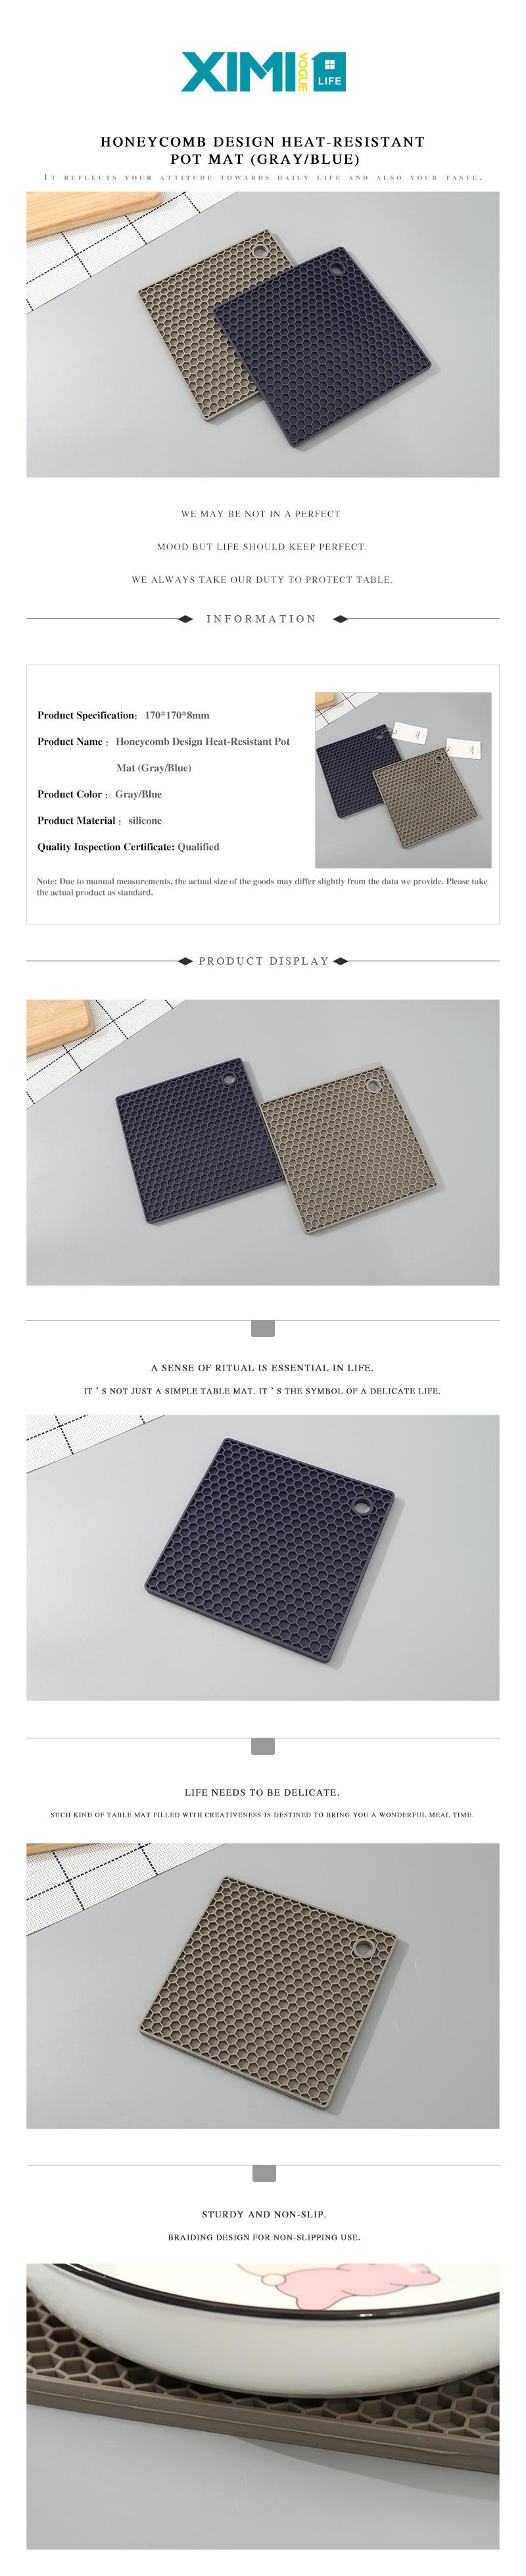 Honeycomb Design Heat-Resistant Pot Mat (Gray/Blue) /></p> </div> </div> </div> <div class=